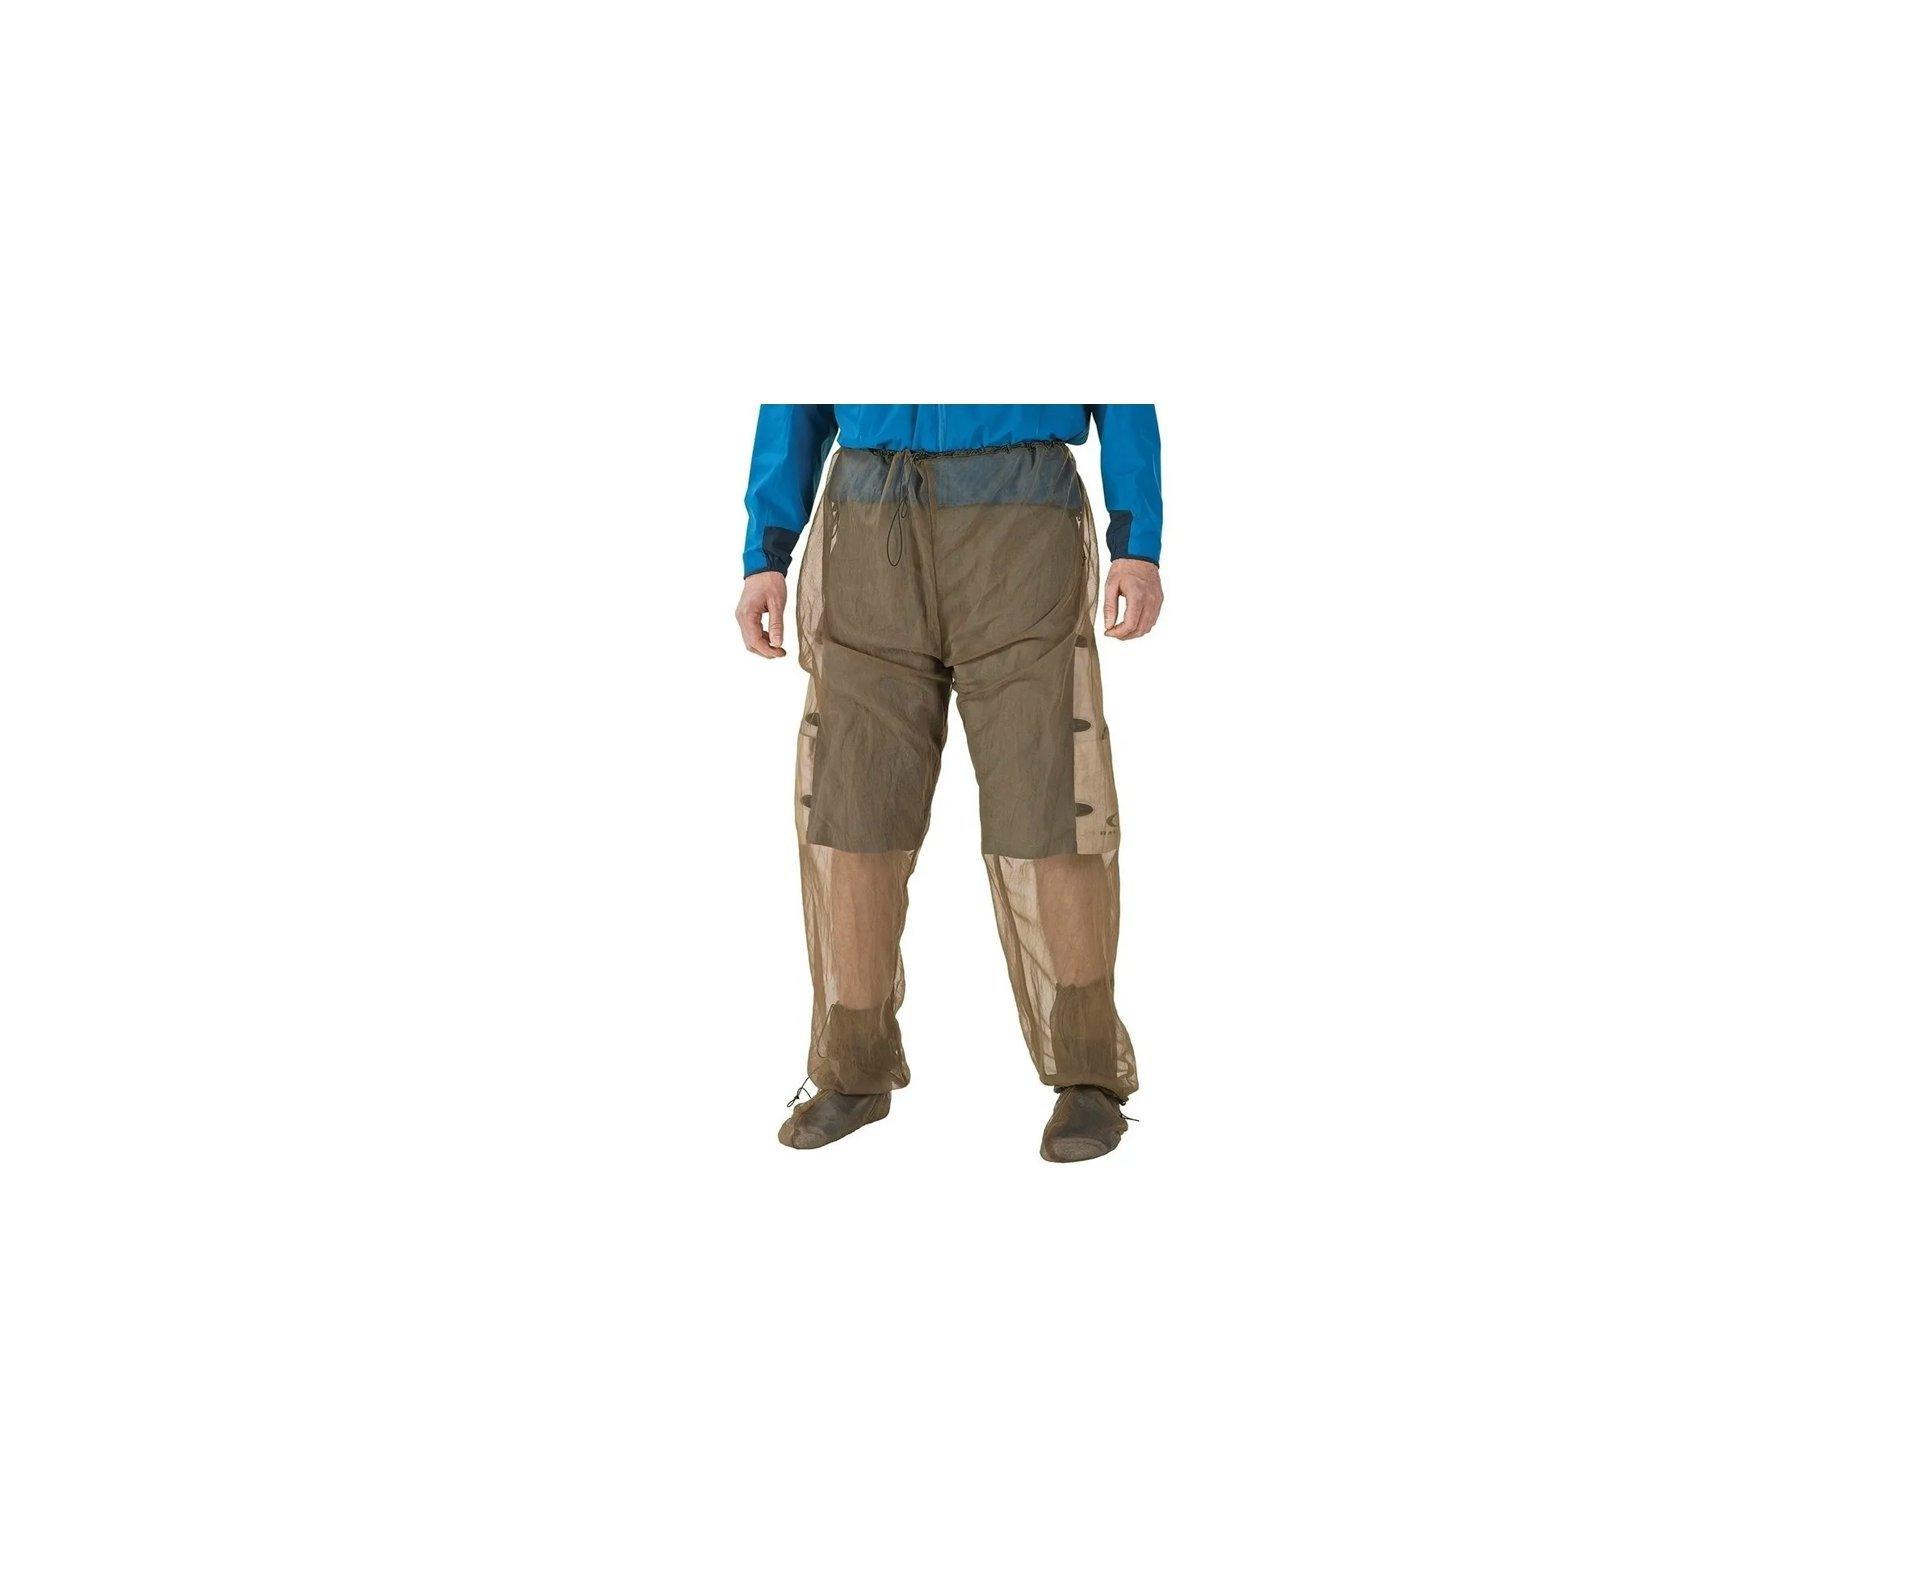 Calça Mosquiteiro Bug Pants C/ Meias - Sea To Summit